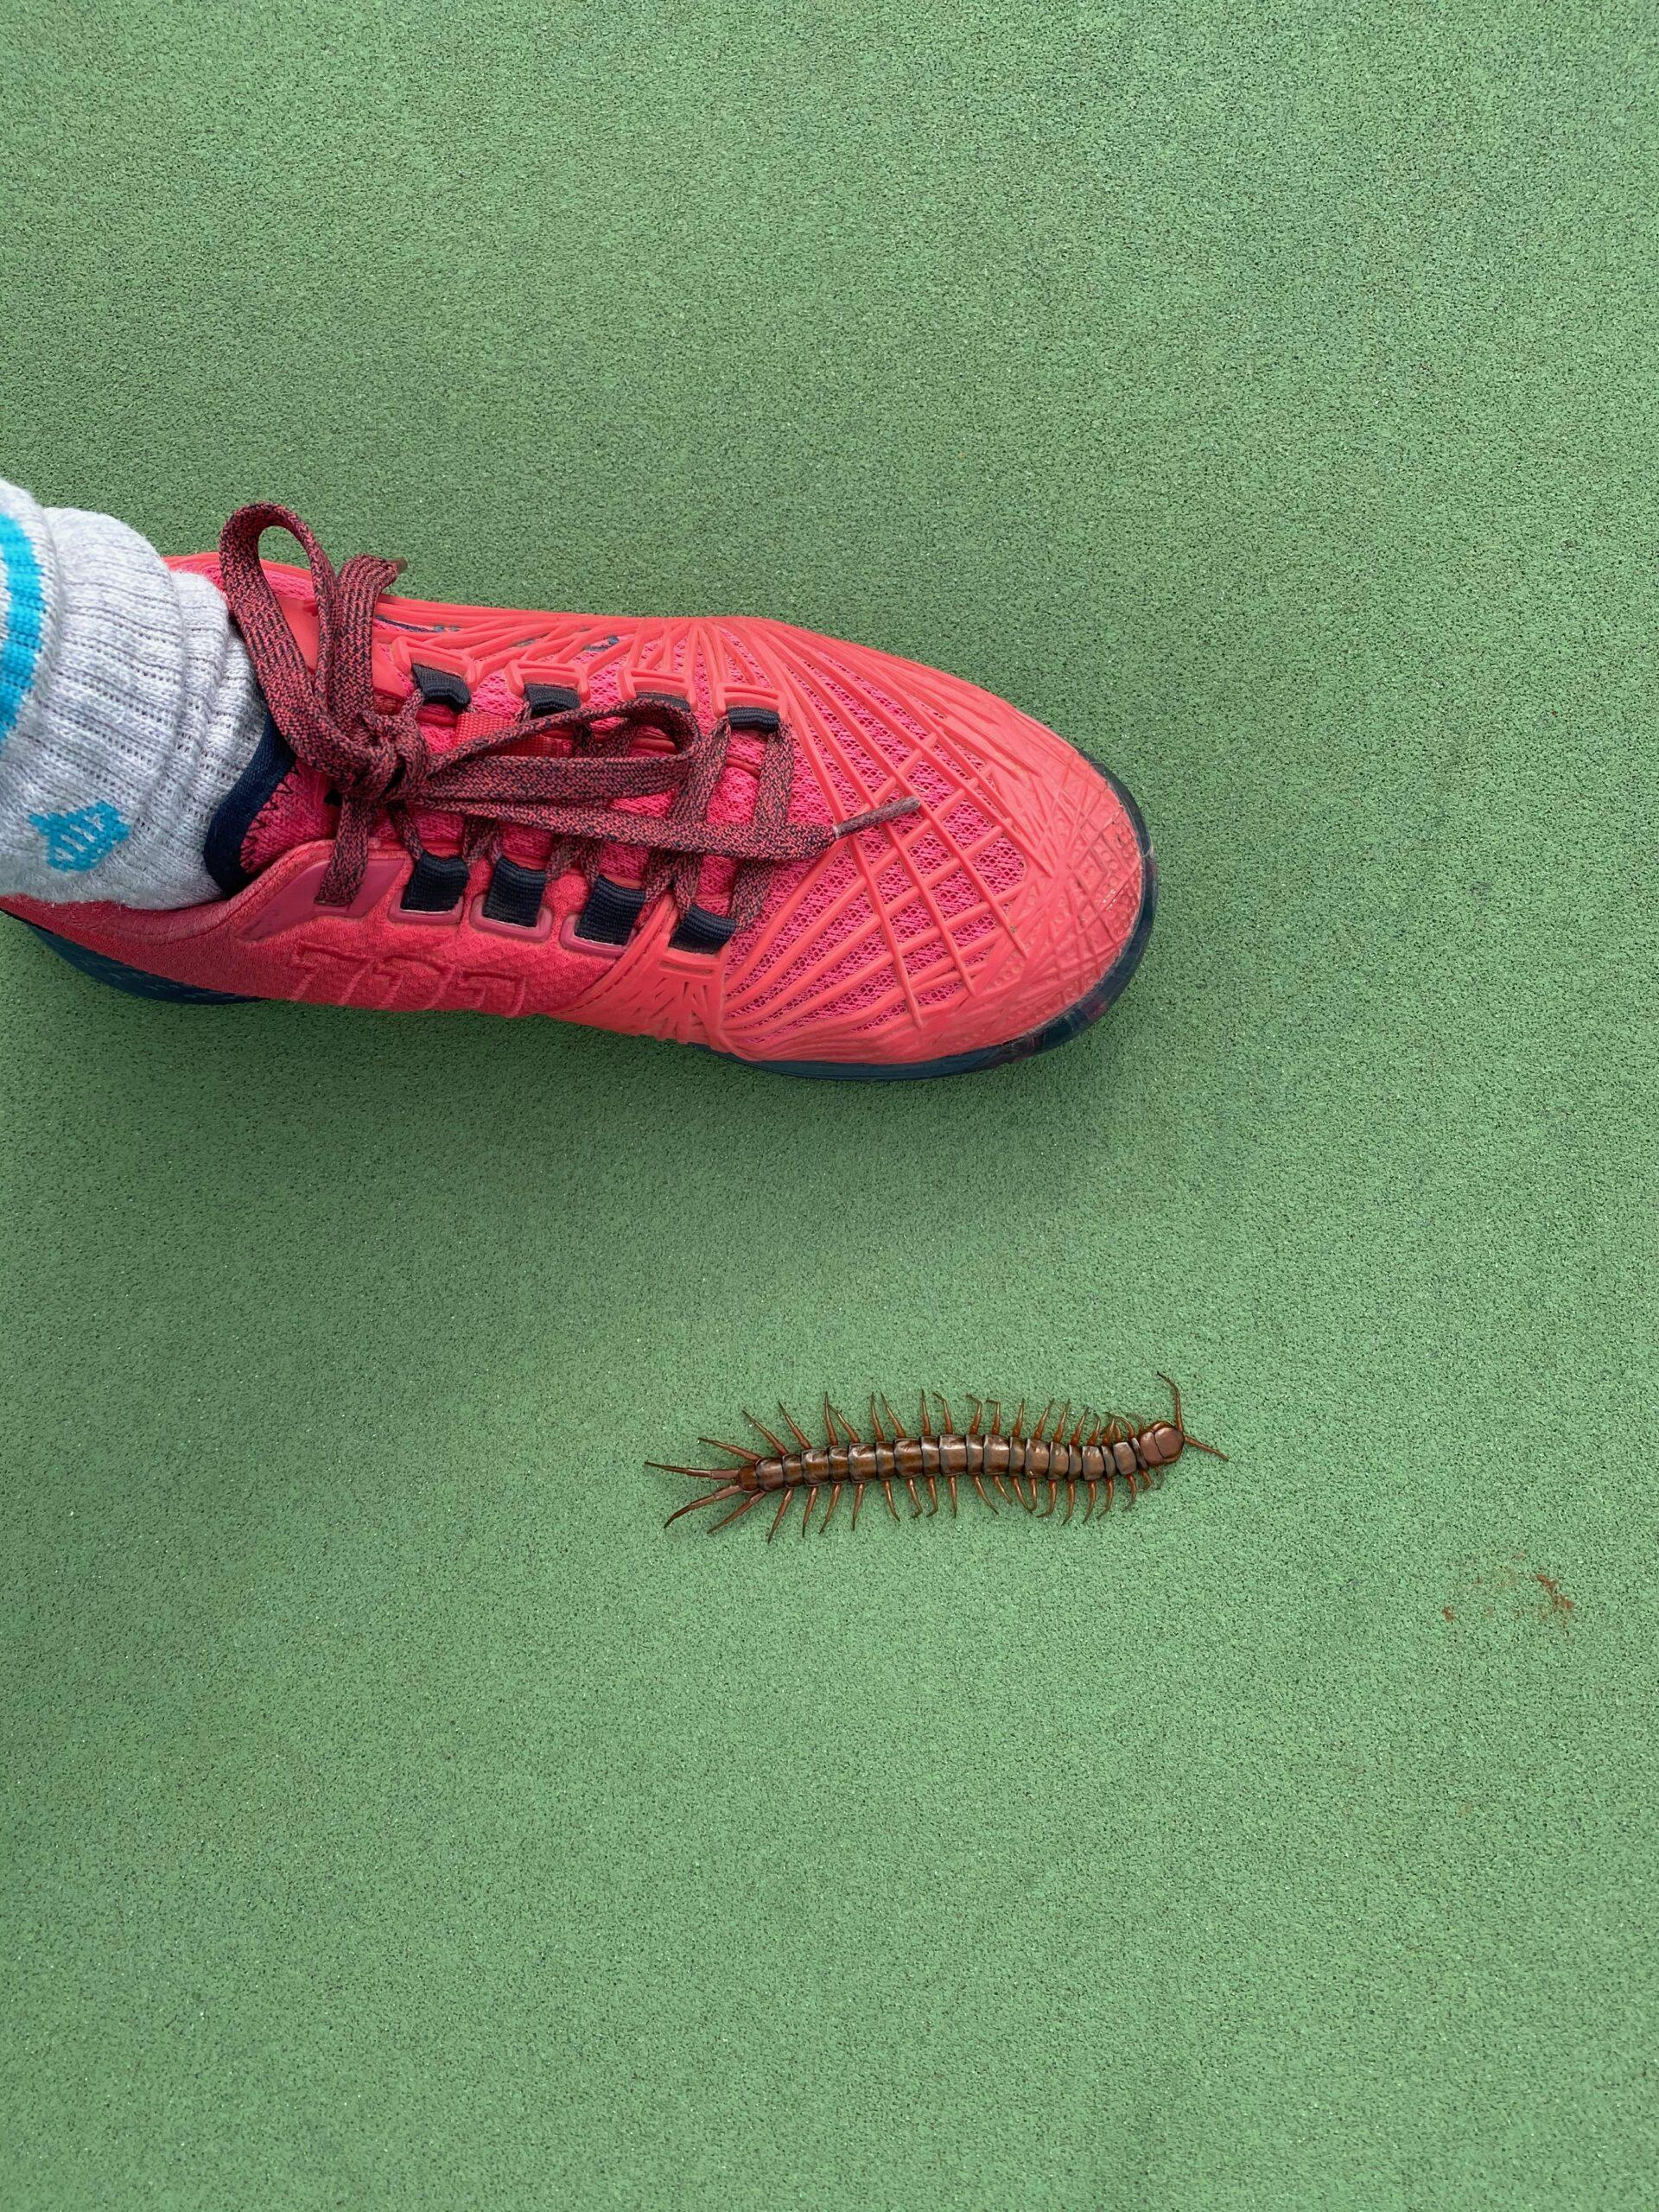 Hawaii Centipede